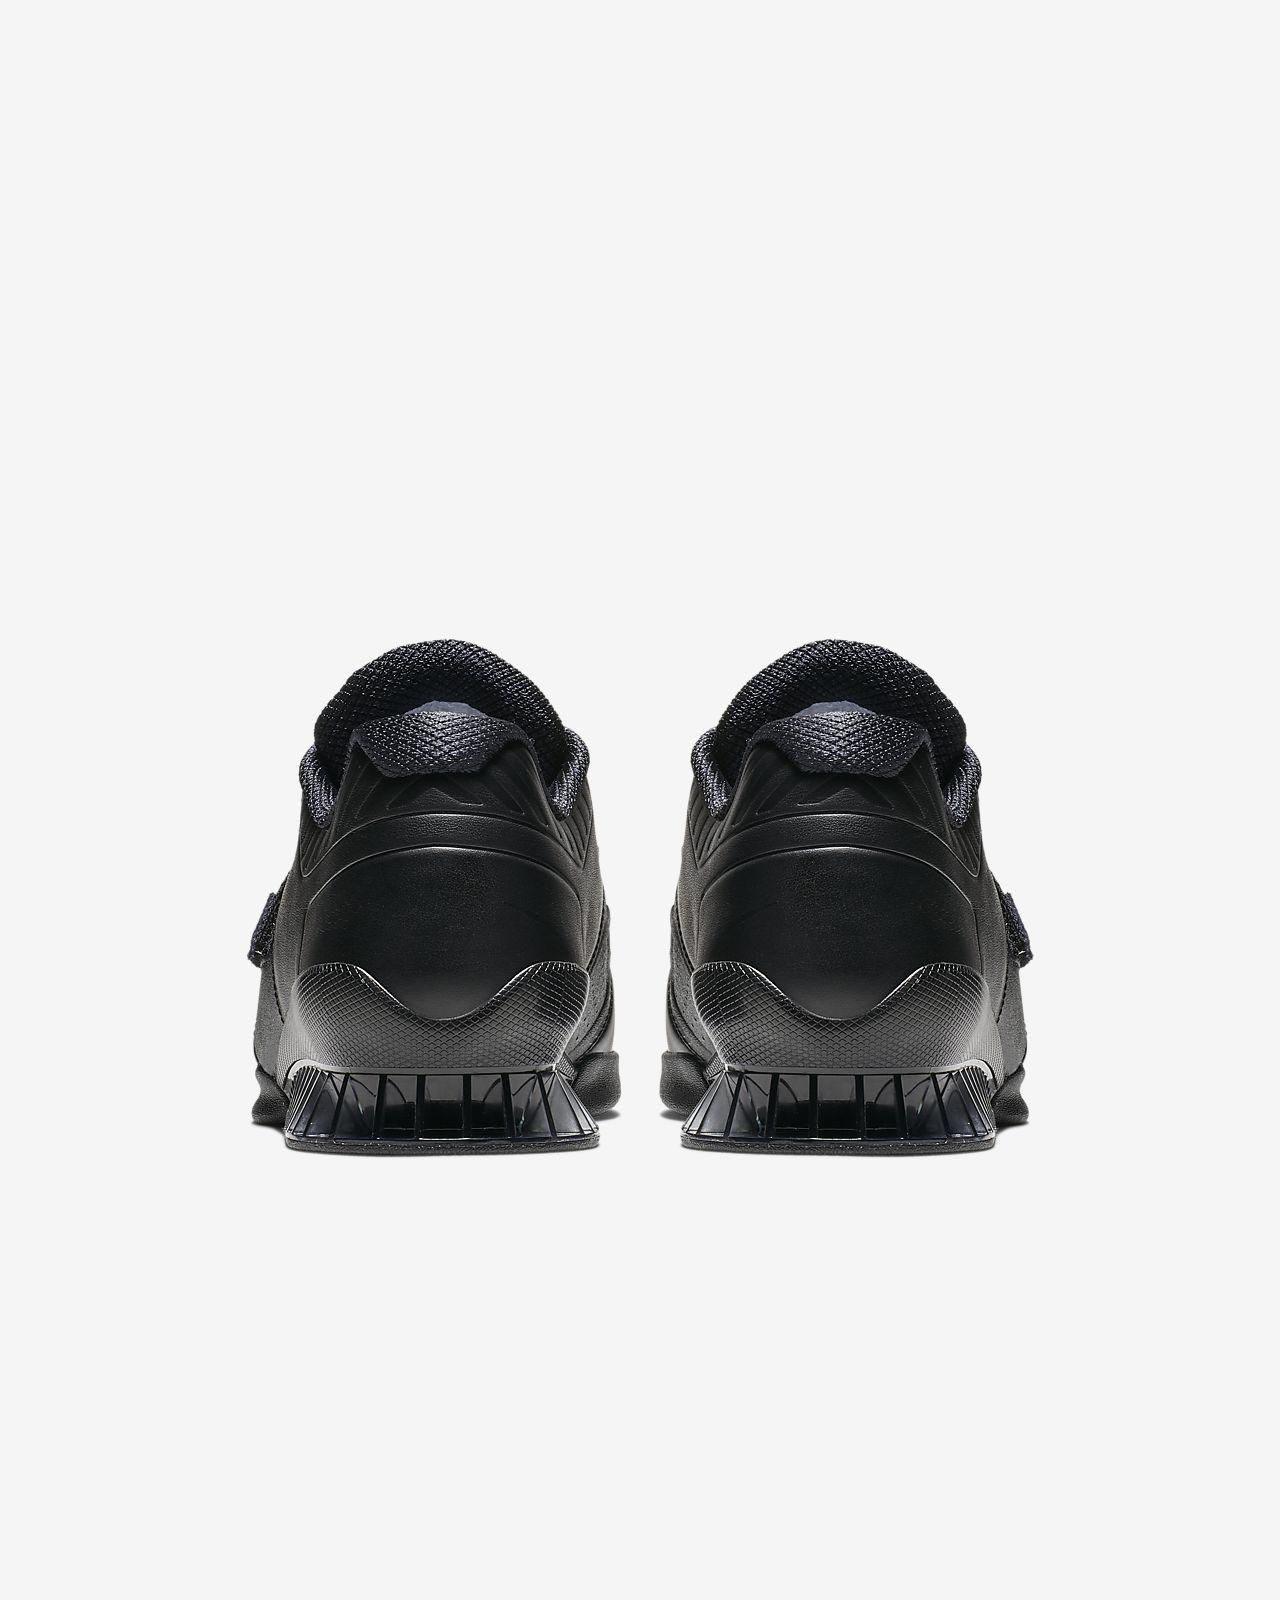 new products 1c0d3 cbd29 ... Nike Romaleos 3 XD Training Shoe